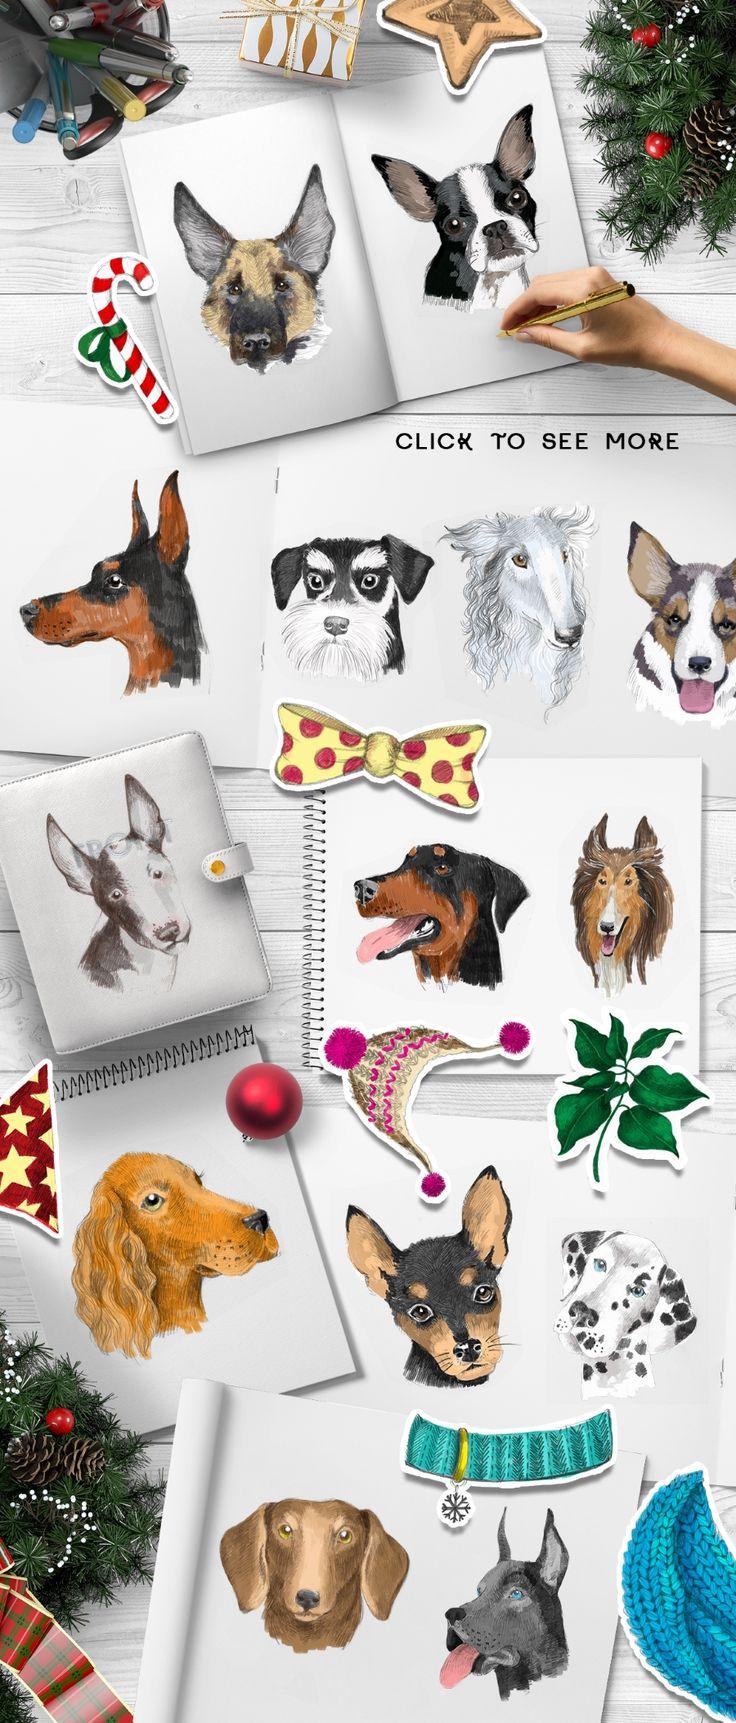 #NewYear Bundle: 15 Different #Dog Breeds and Elements | #masterbundles